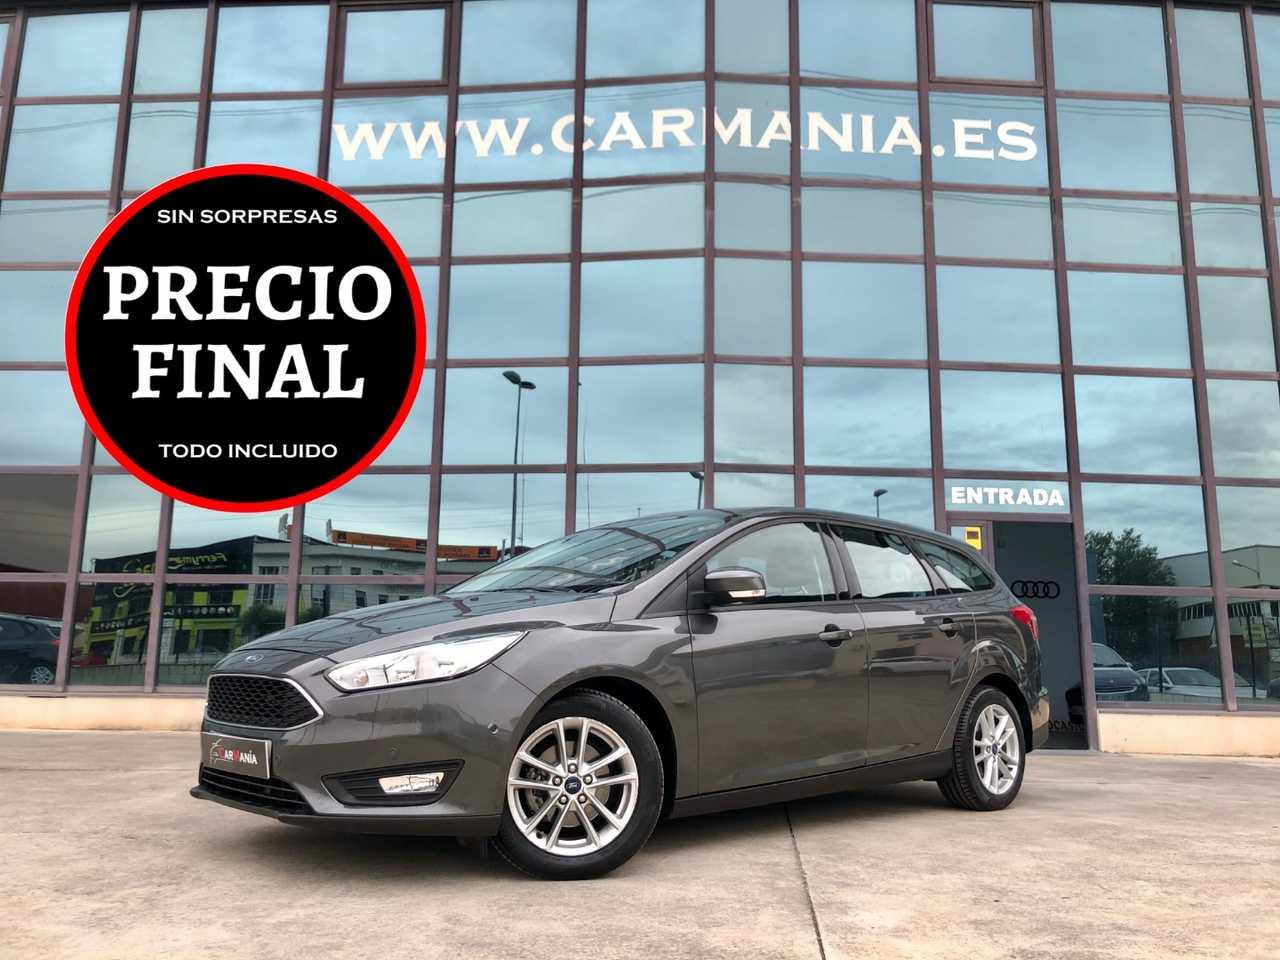 Ford Focus 1.5 TDCi SPORTBREAK Business  - Foto 1